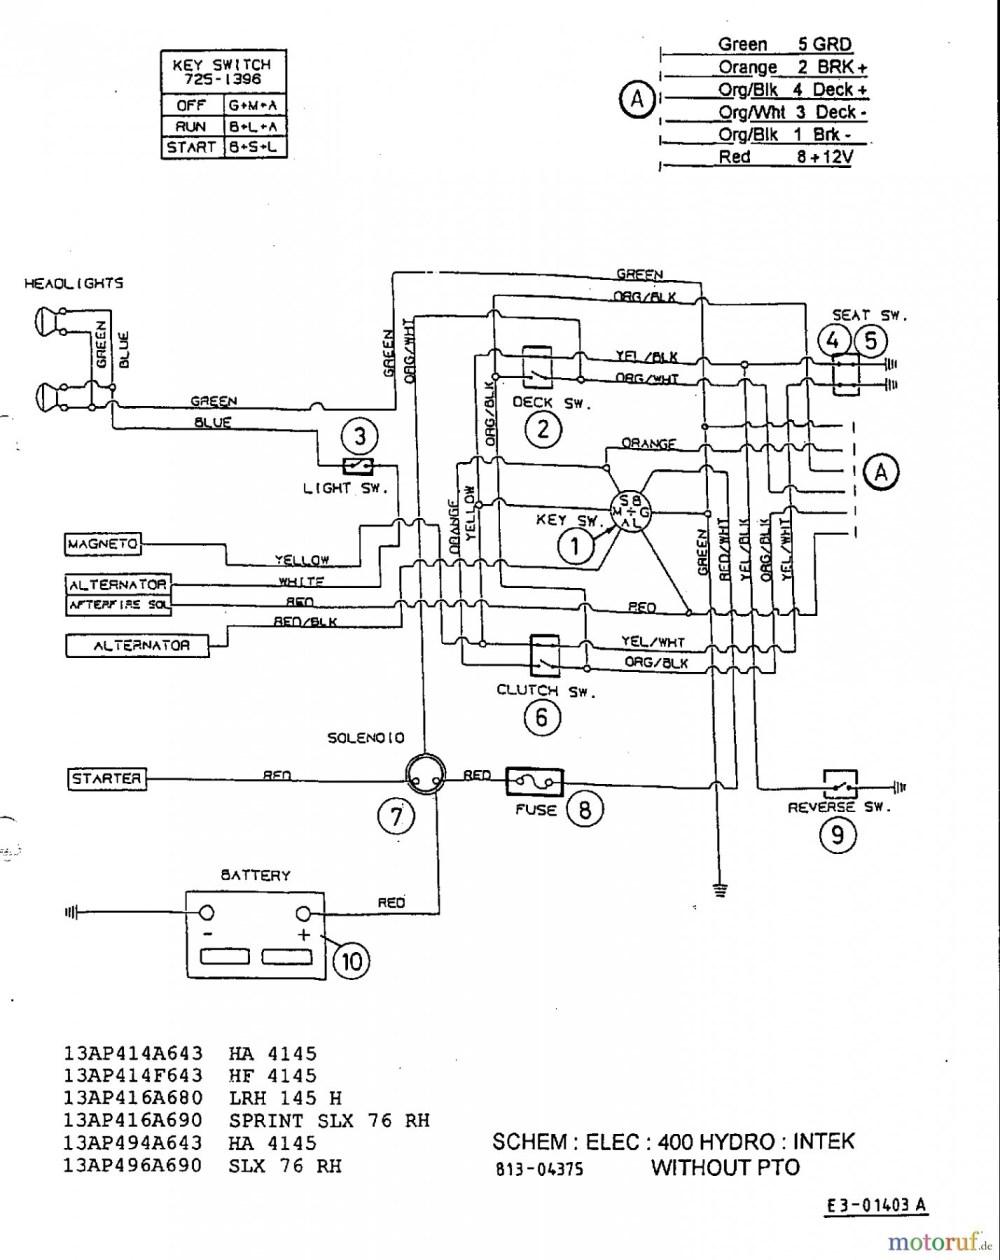 medium resolution of mtd lawn tractor schematics wiring diagram log wiring diagram mtd lawn tractor wiring schematic mtd lawn tractor